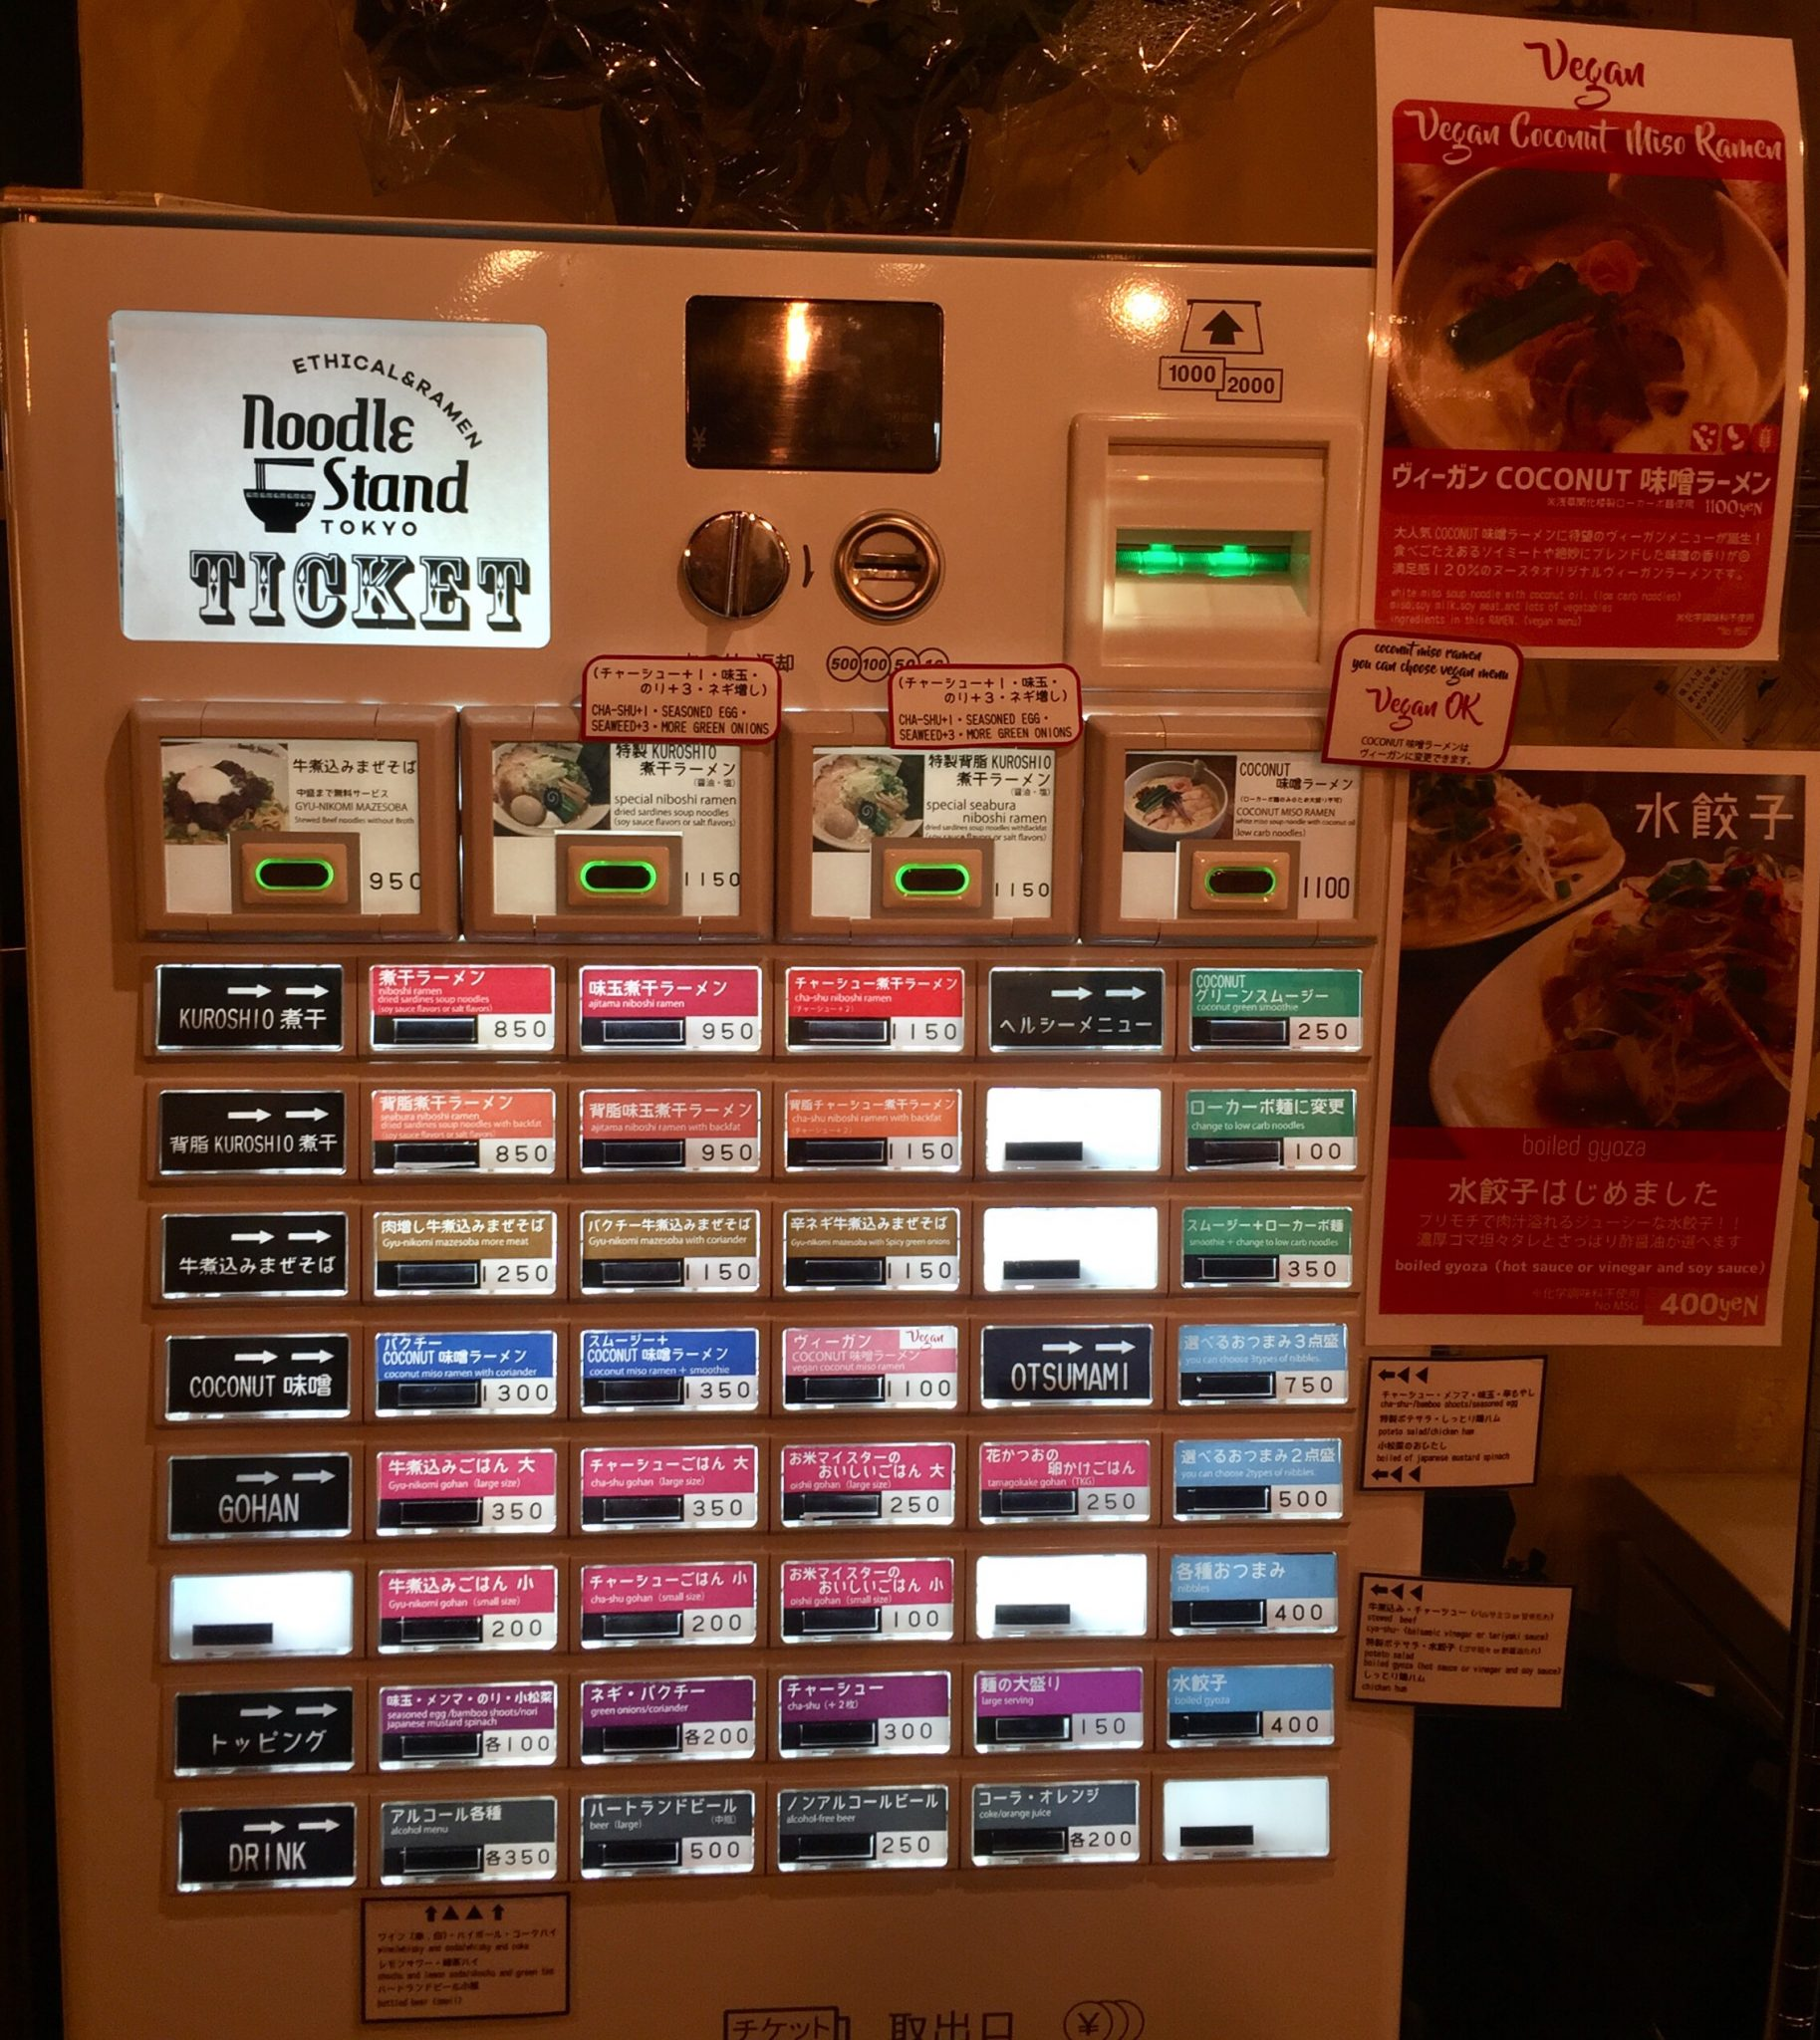 Noodle Stand Tokyo(ヌードルスタンドトーキョー) ヌースタ 券売機 メニュー